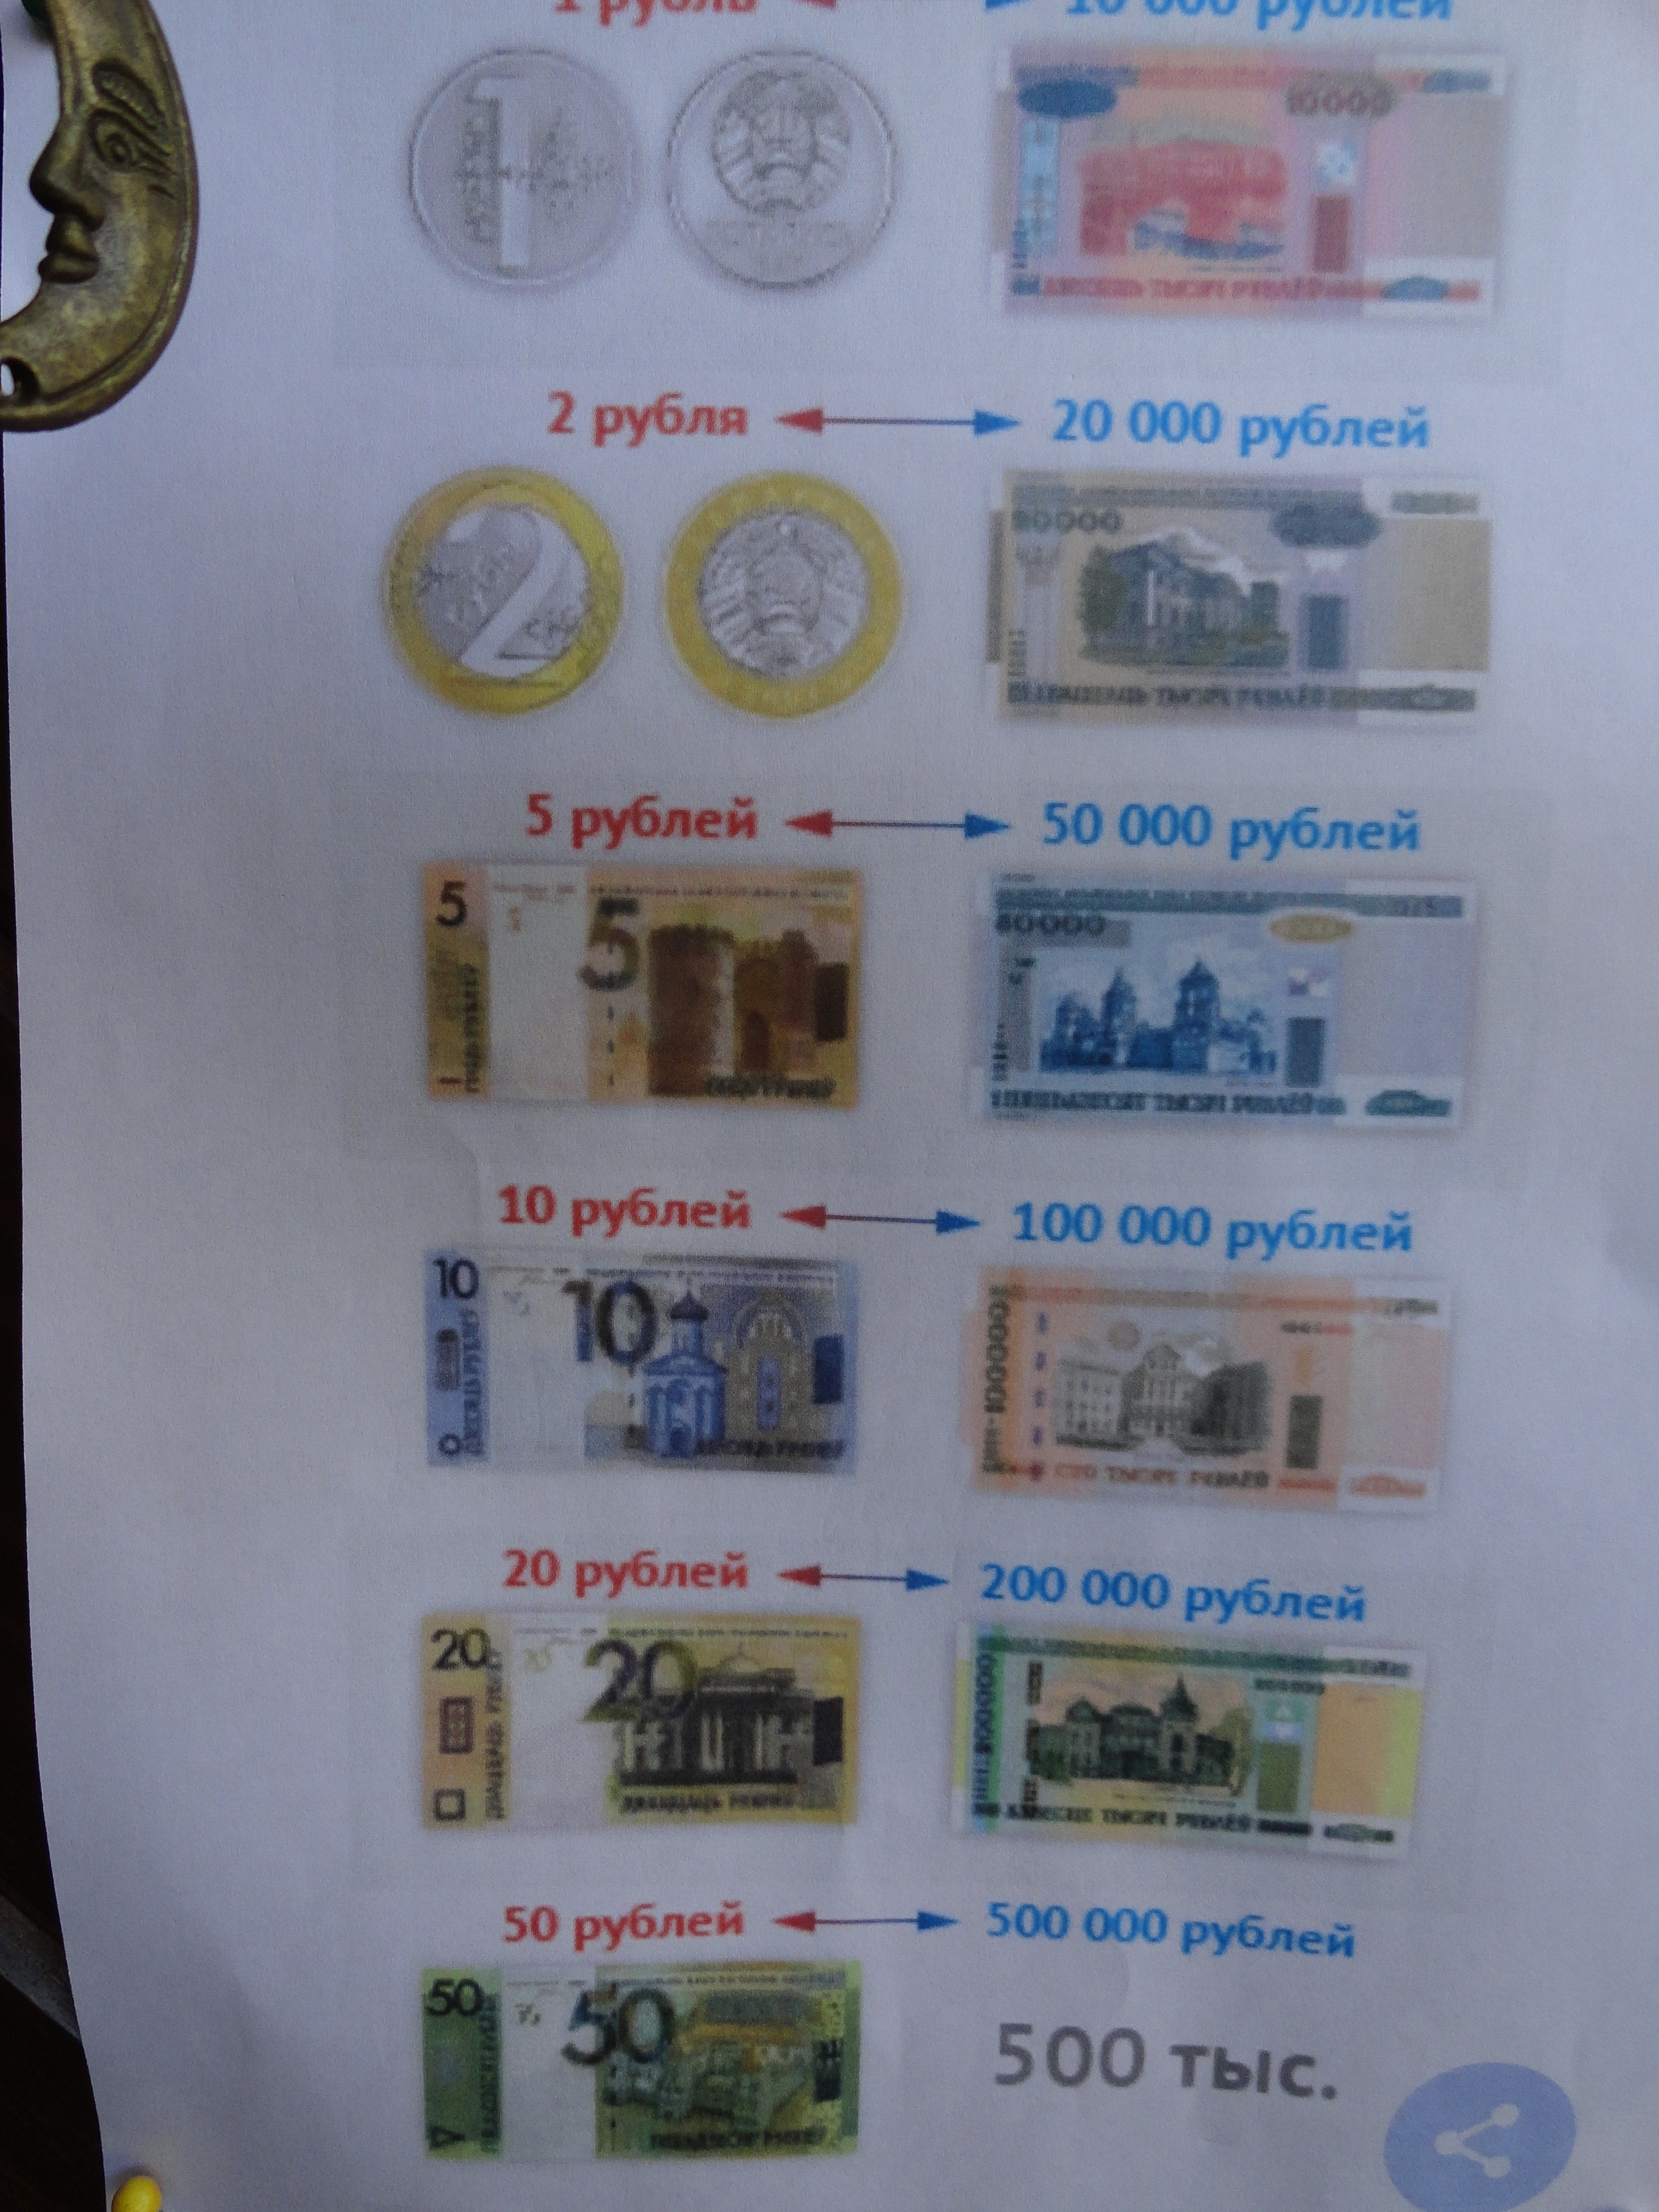 Conversion chart for ruble de-nomination outside a restaurant.